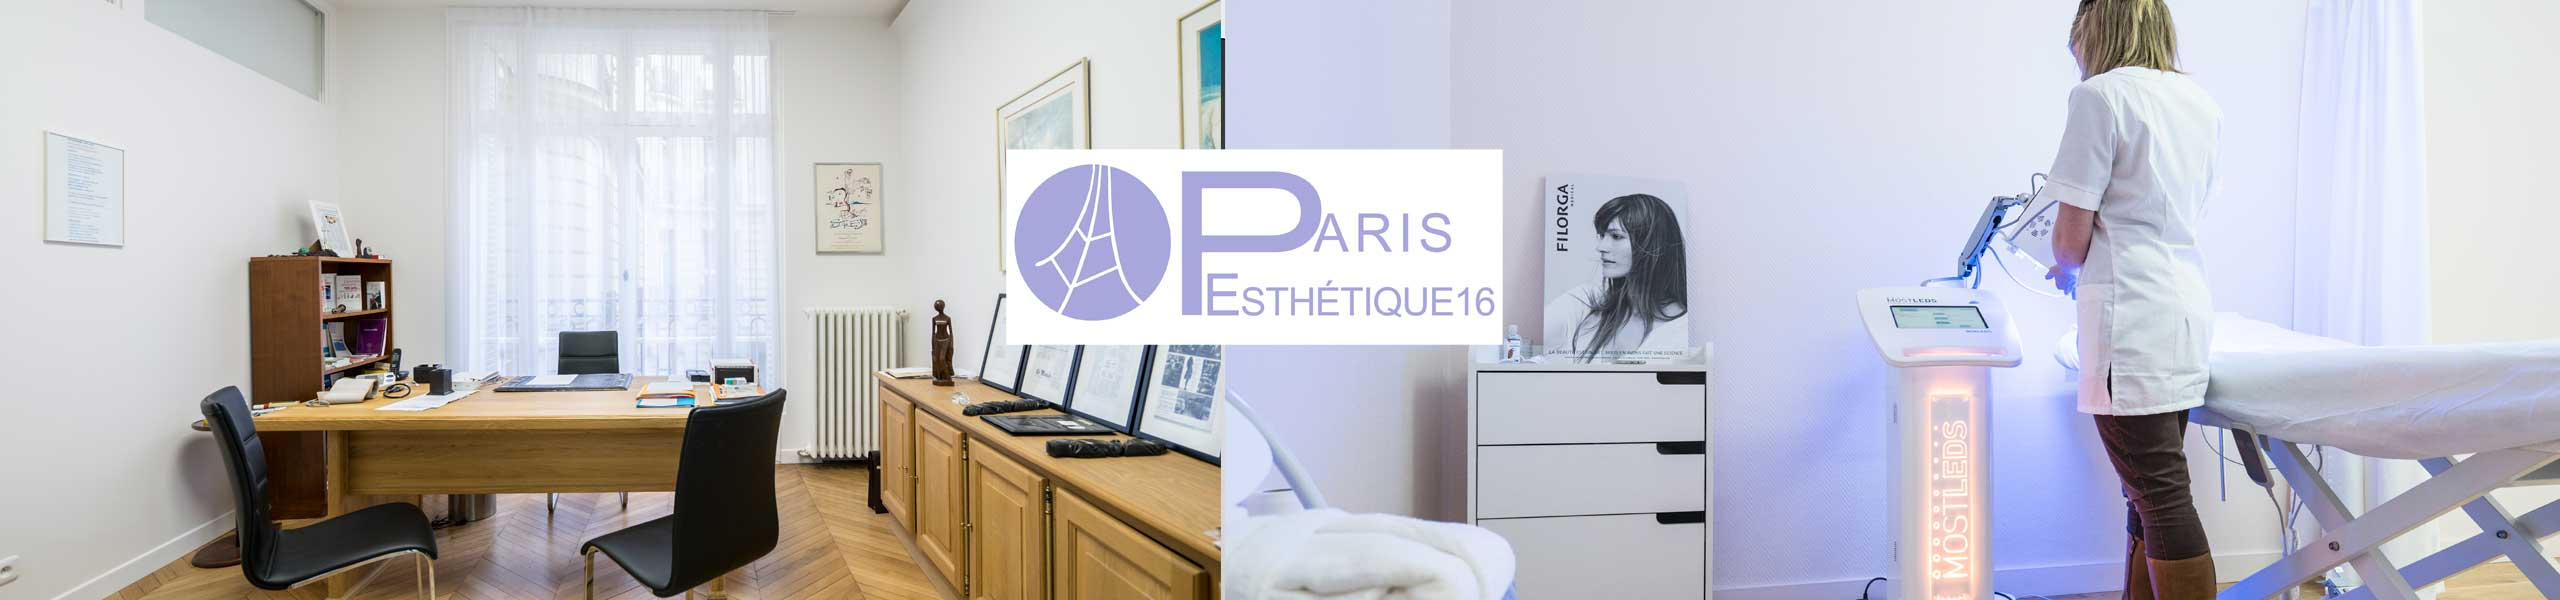 Centre Paris Esthétique 16 anti-age Victor Hugo